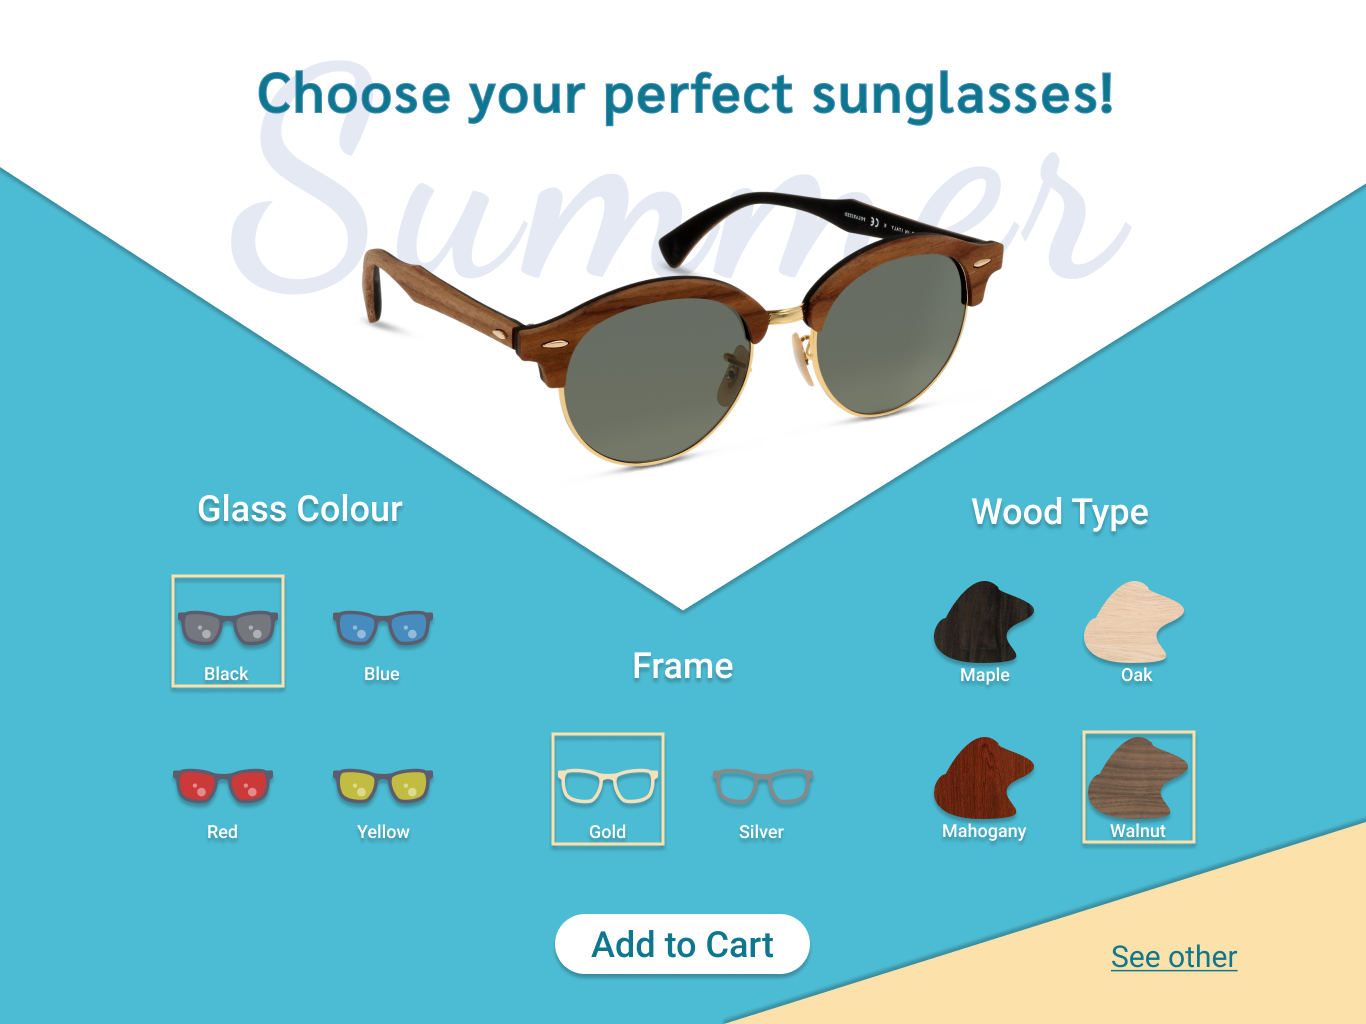 033 customize product uxui uidesign ux ui design dailyui